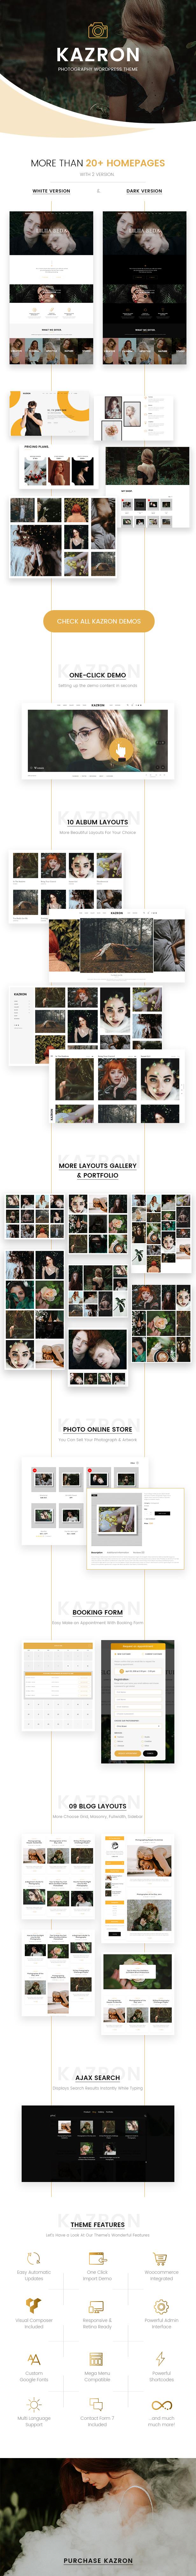 Kazron – Photography WordPress Theme (Photography) description kazron